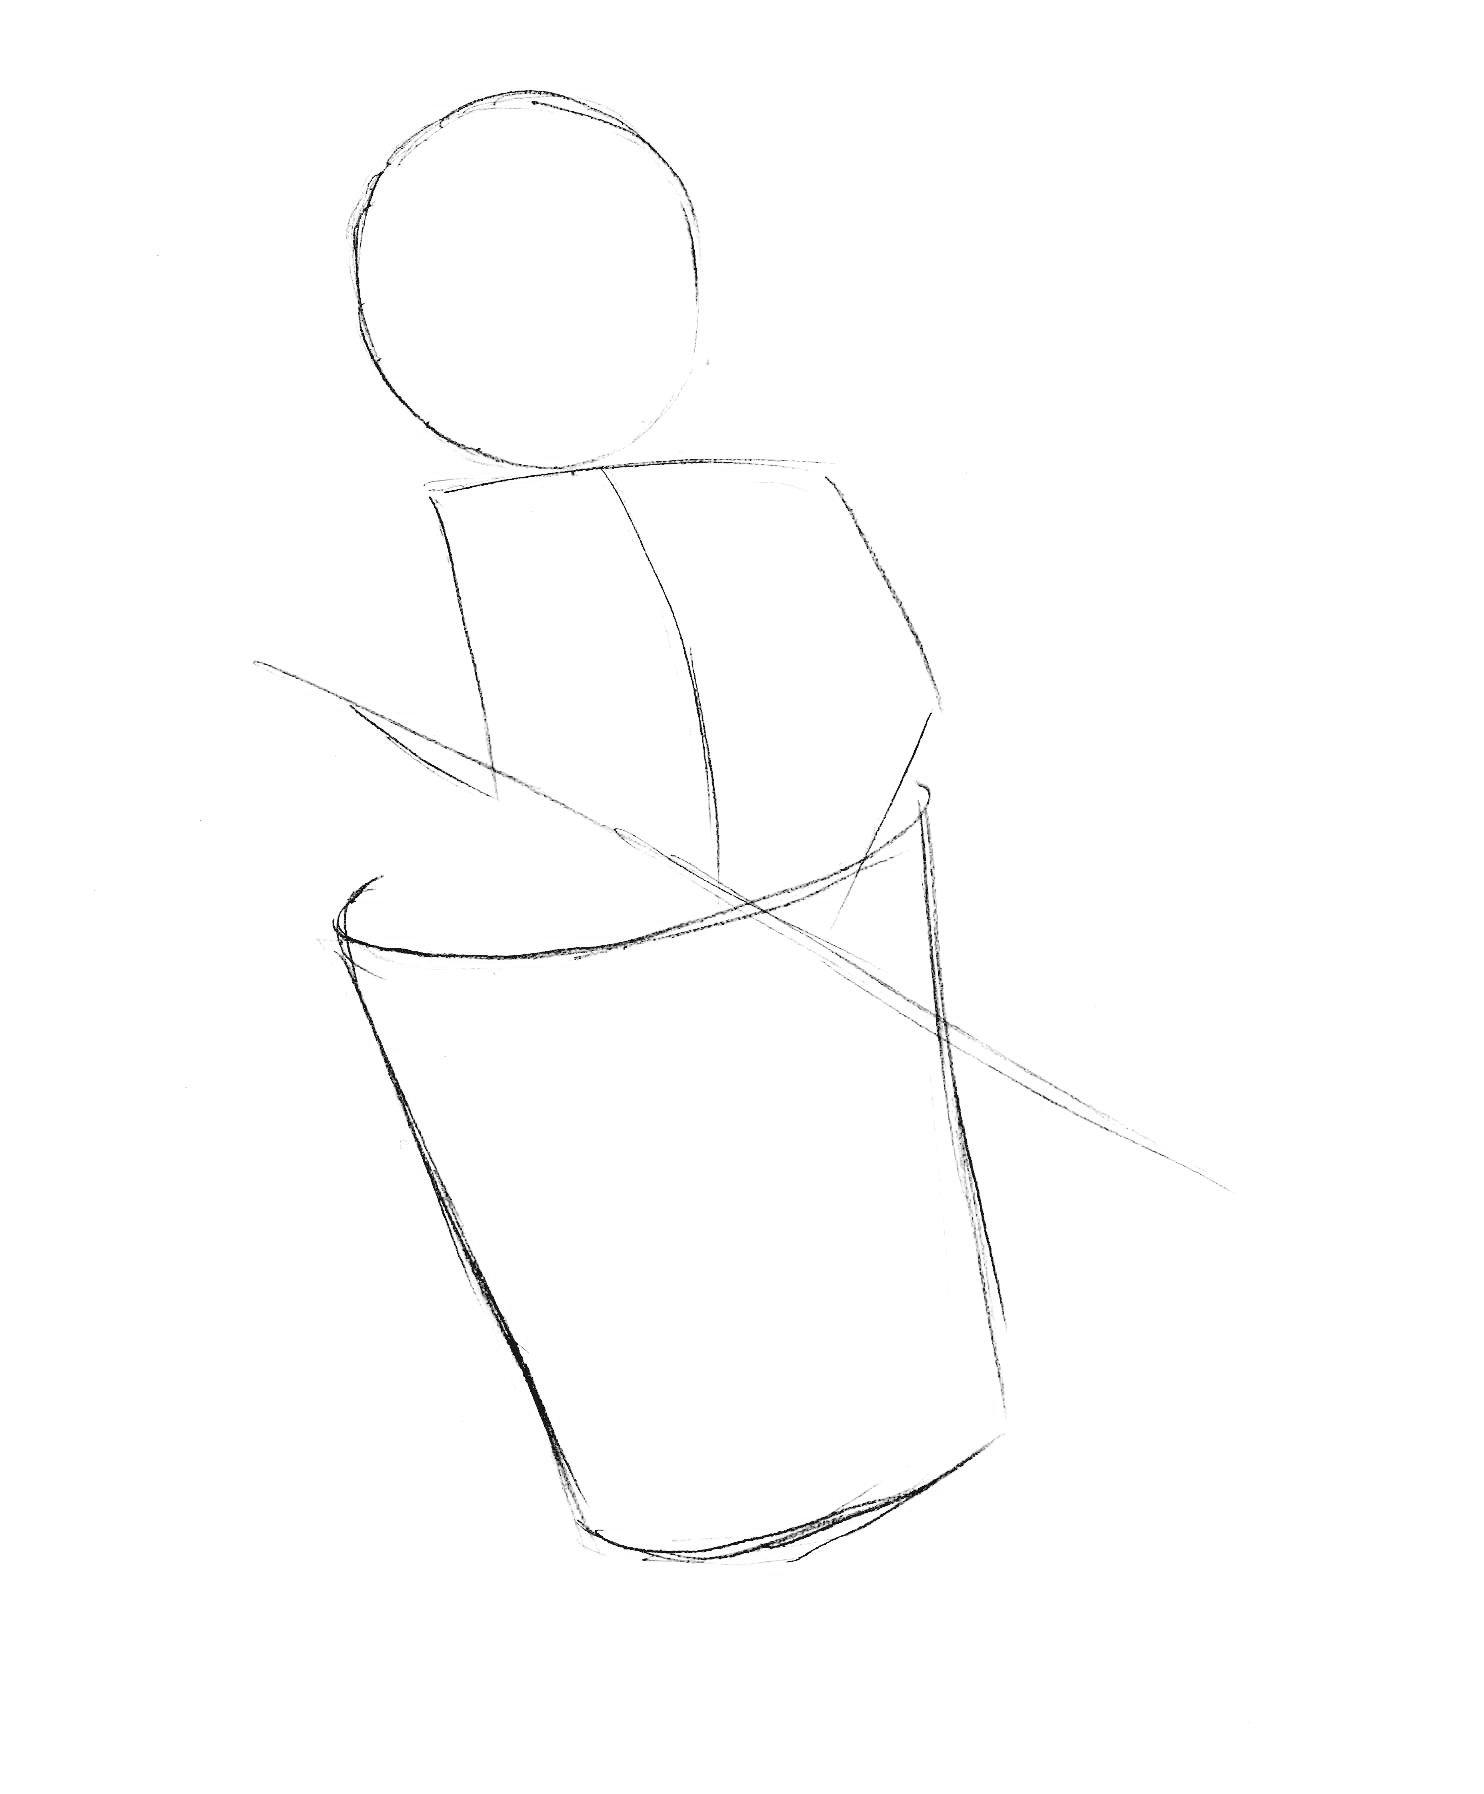 как нарисовать бабу-ягу карандашом